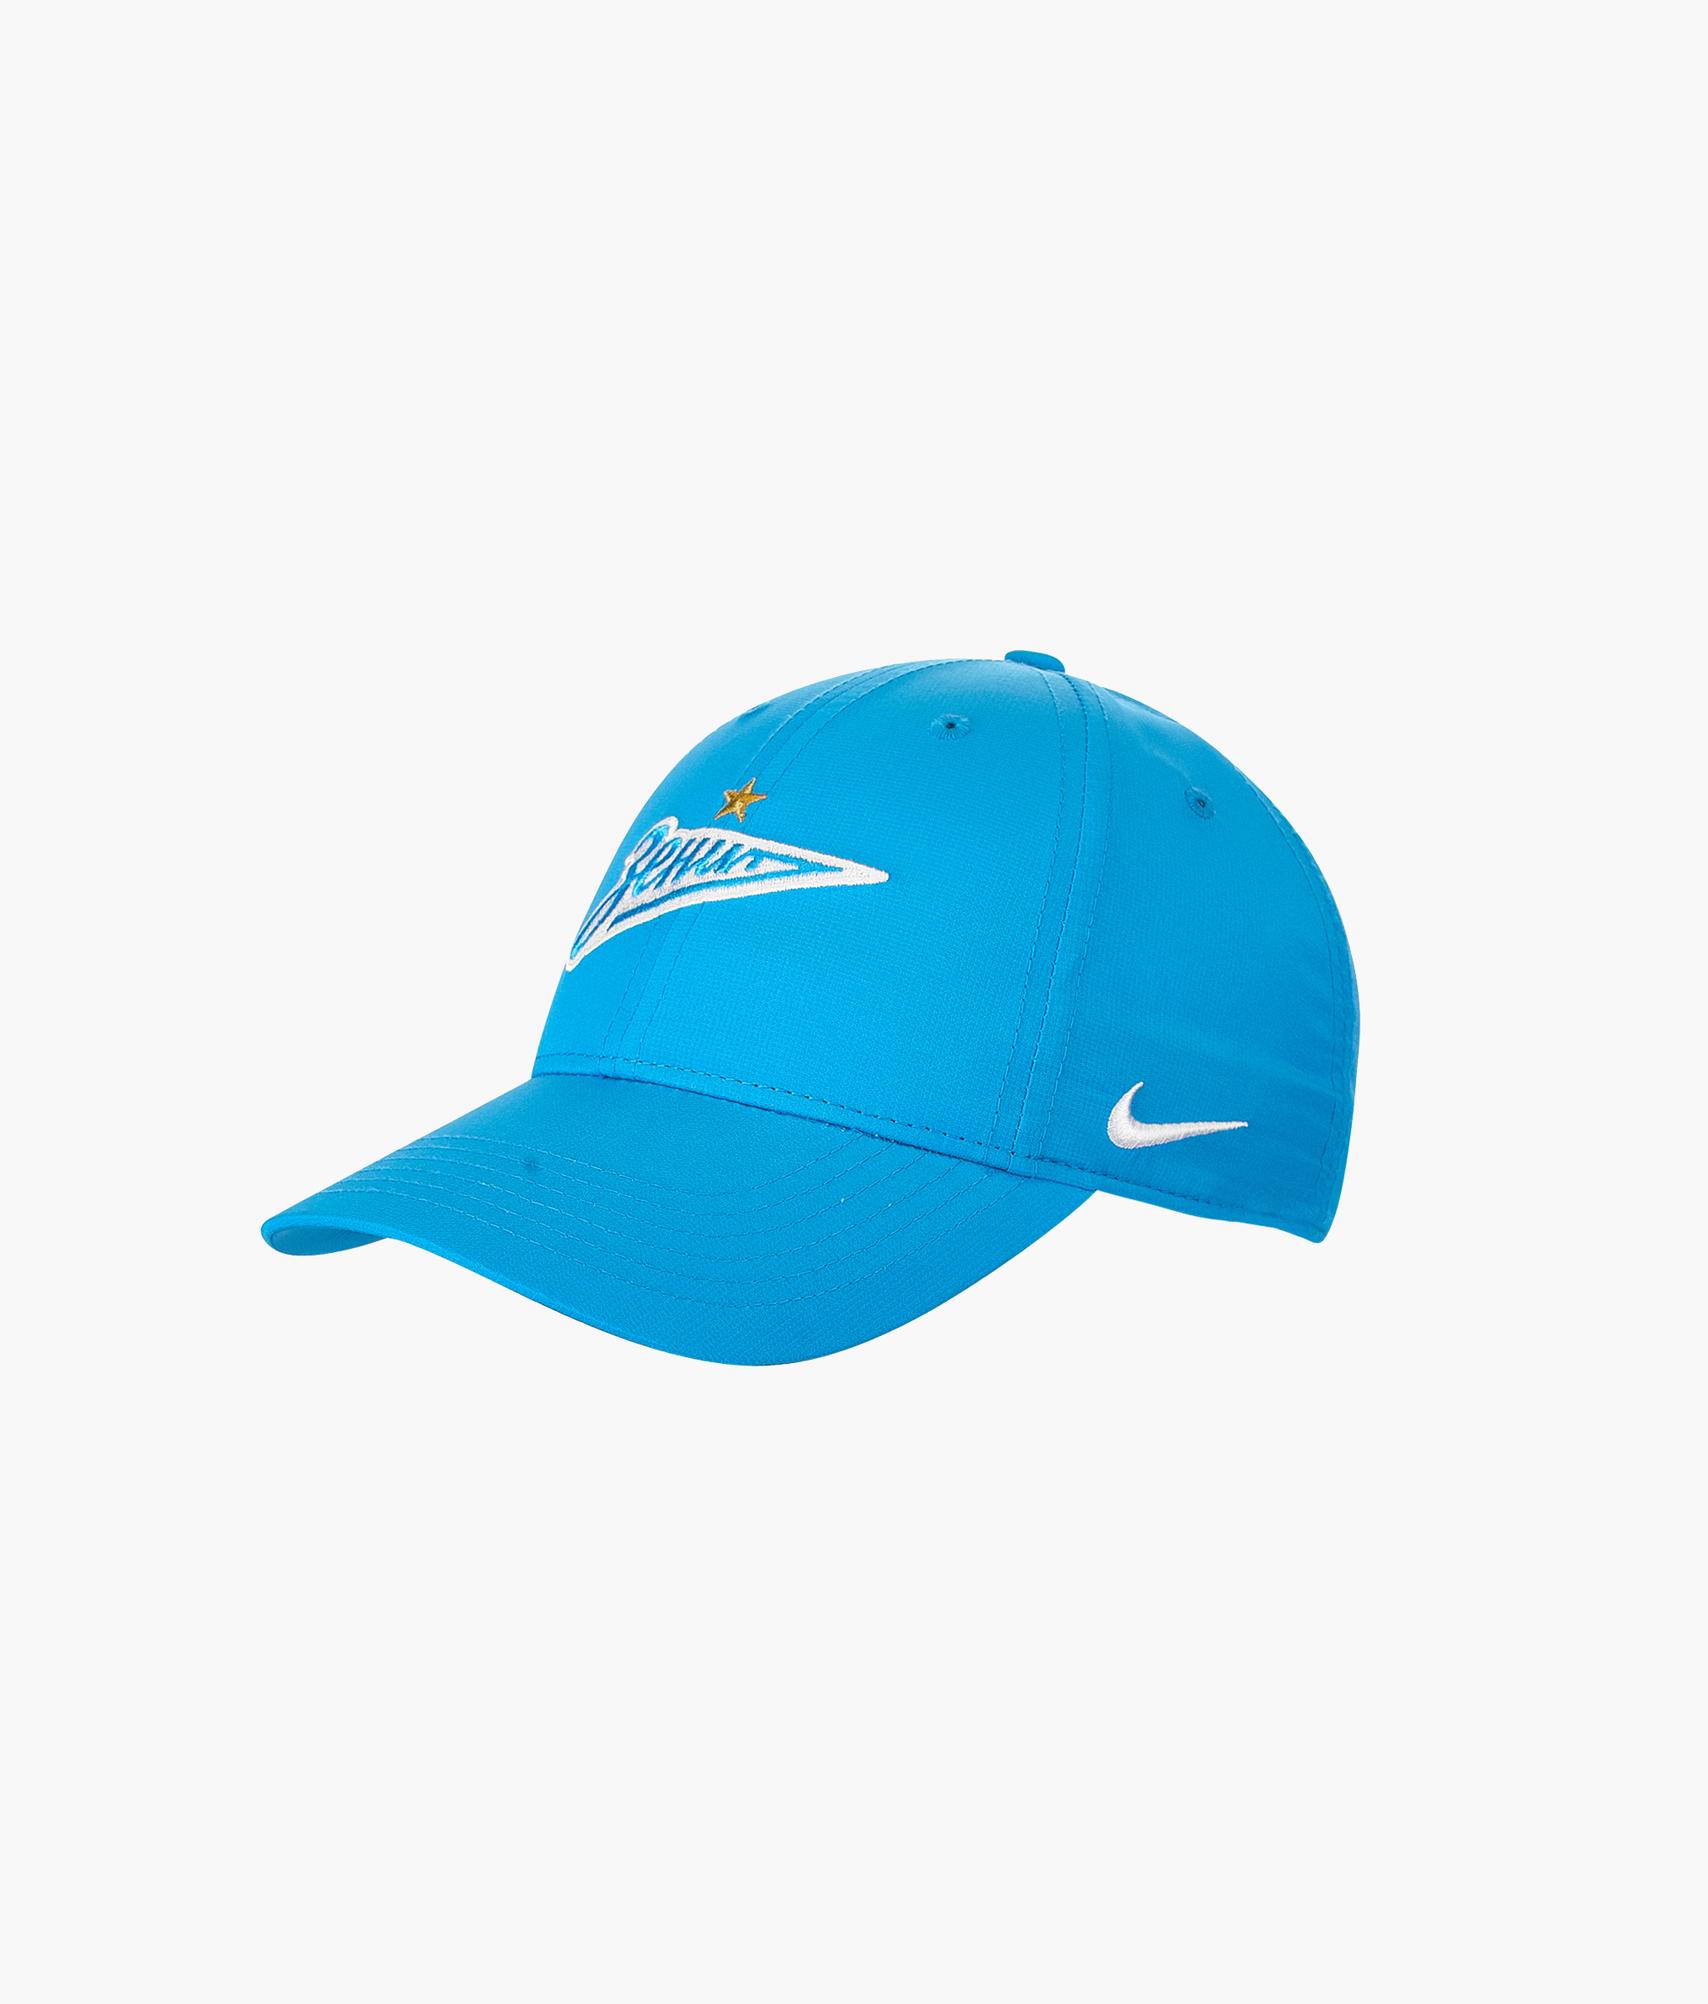 Бейсболка детская Nike Zenit Nike Цвет-Синий цена 2017